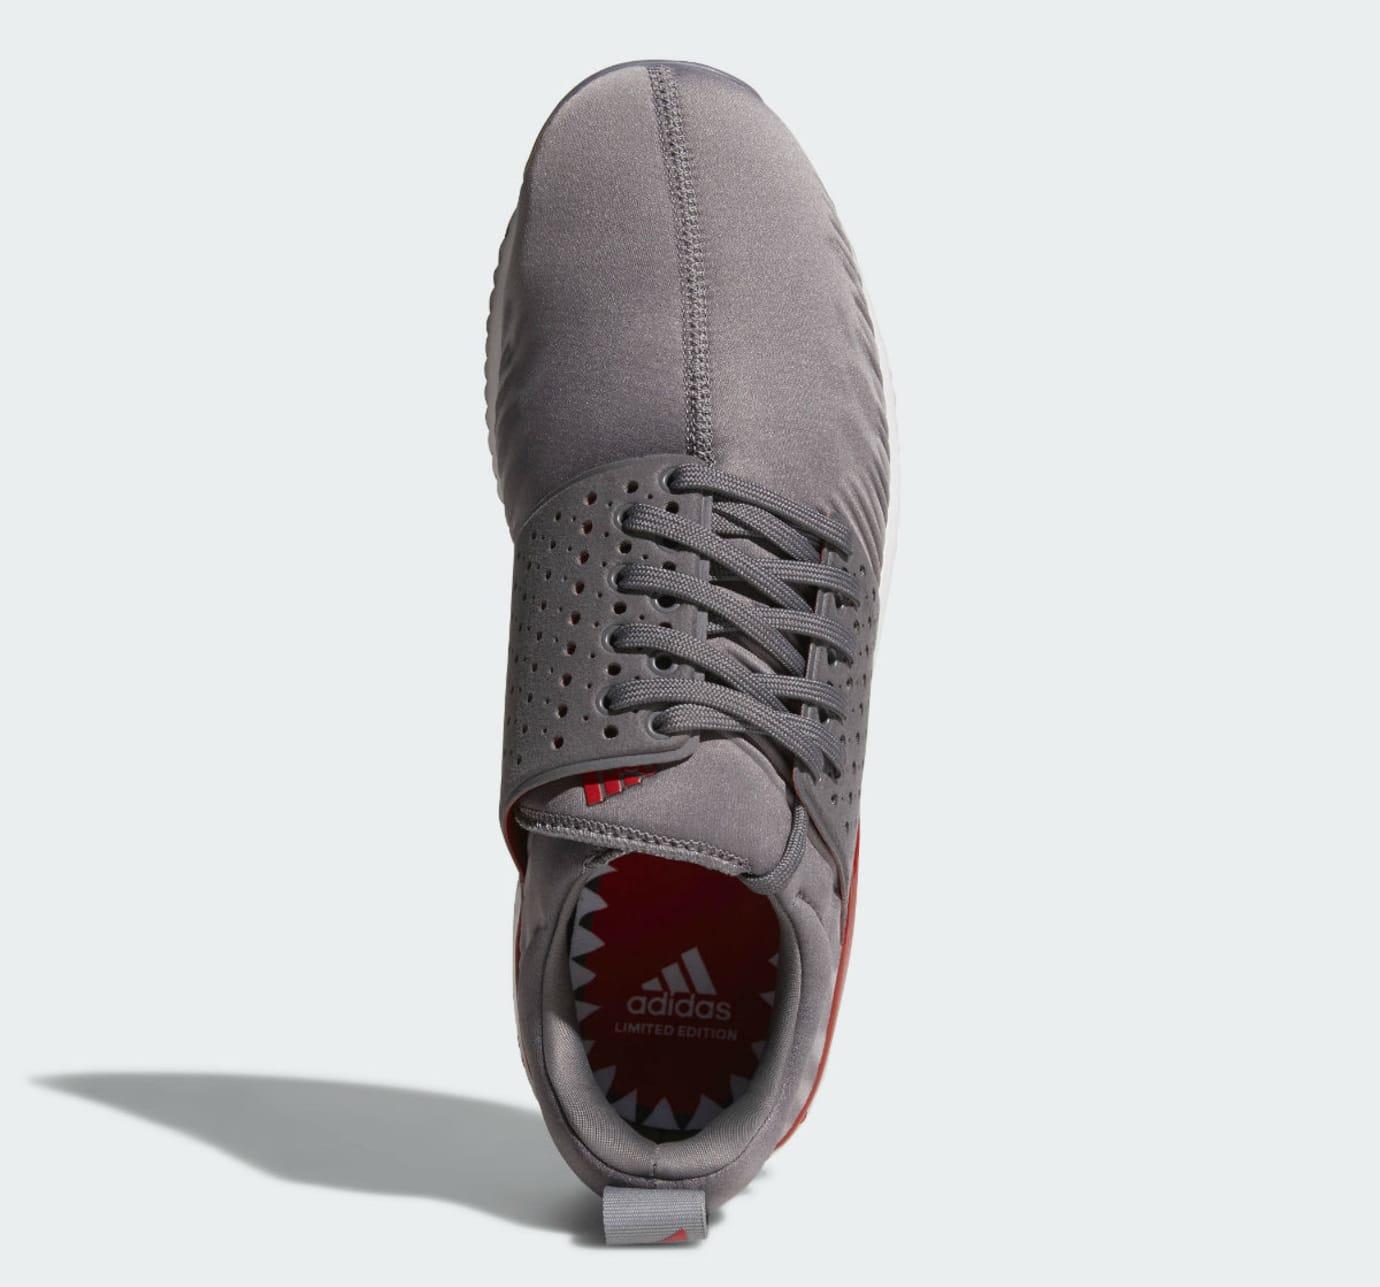 Adidas Adicross Bounce Niuhi Release Date AC8212 Top